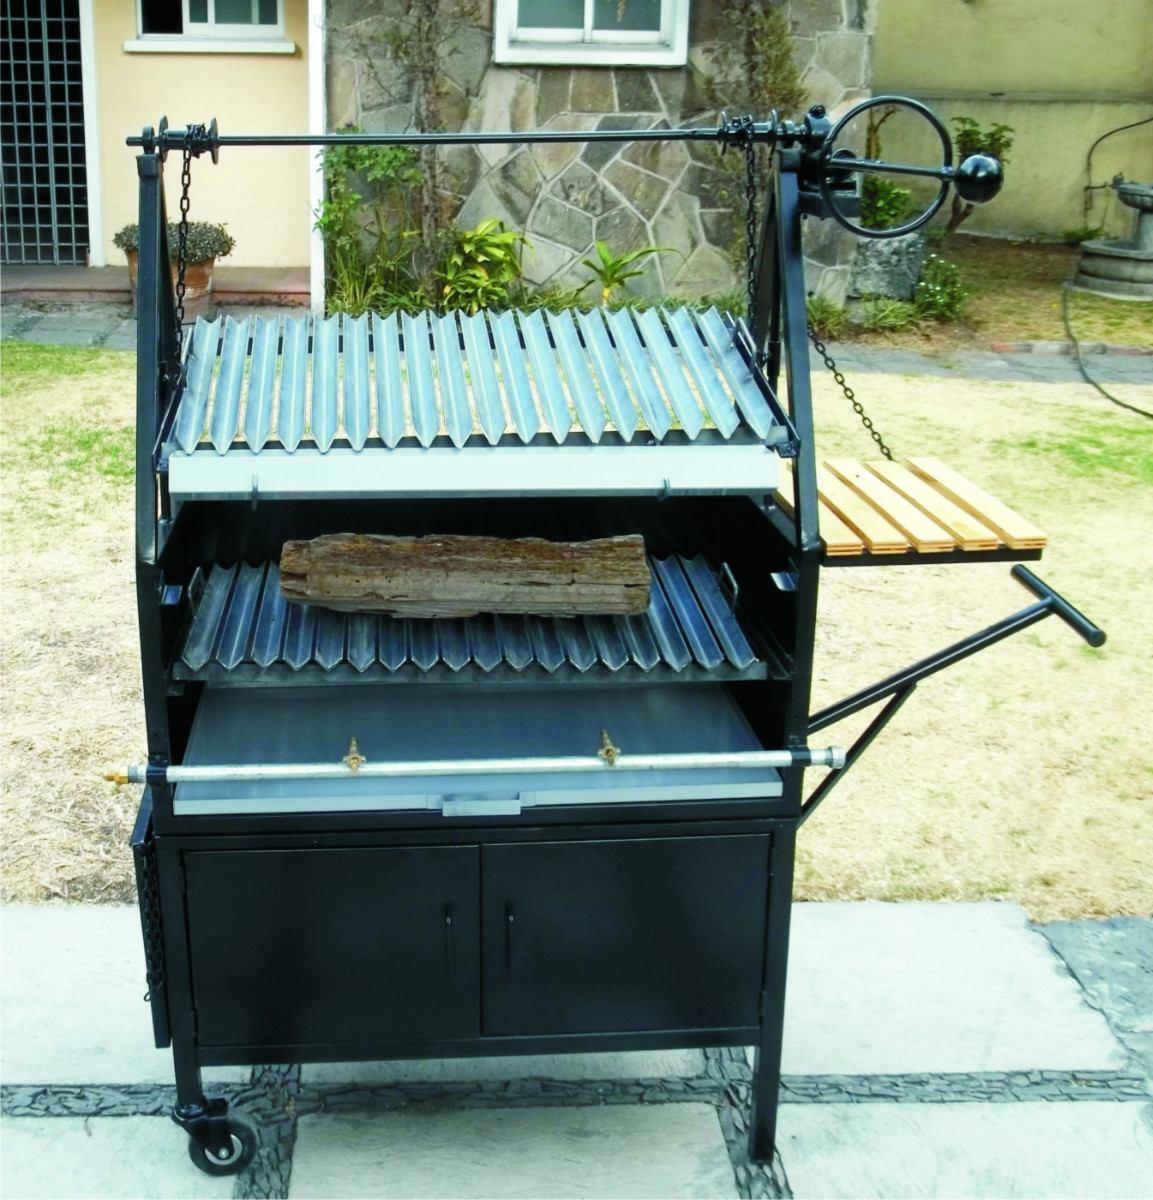 Asadores de carne al carbon tipo parrilla argentino - Parrillas para asar carne ...